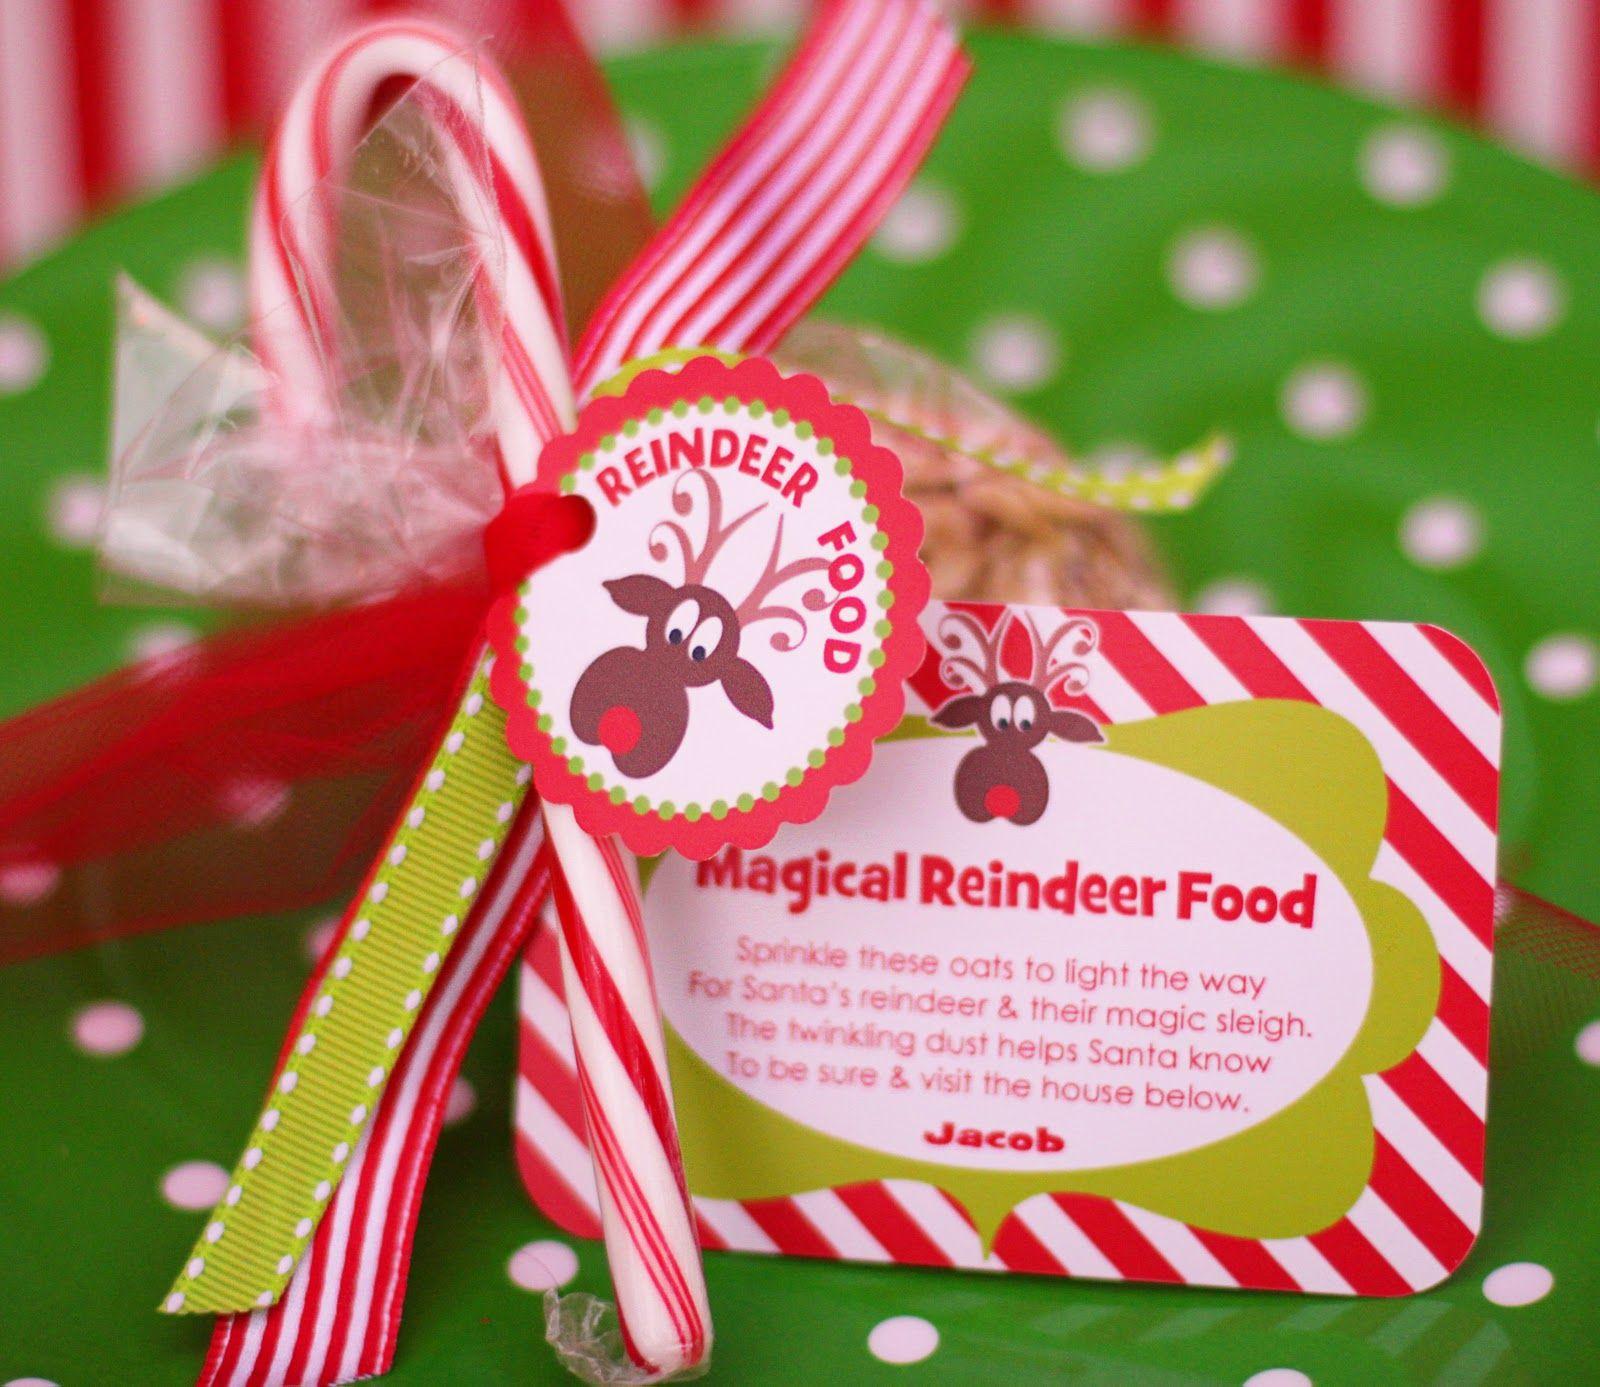 Magic Reindeer Food Magic Reindeer Food Reindeer Food School